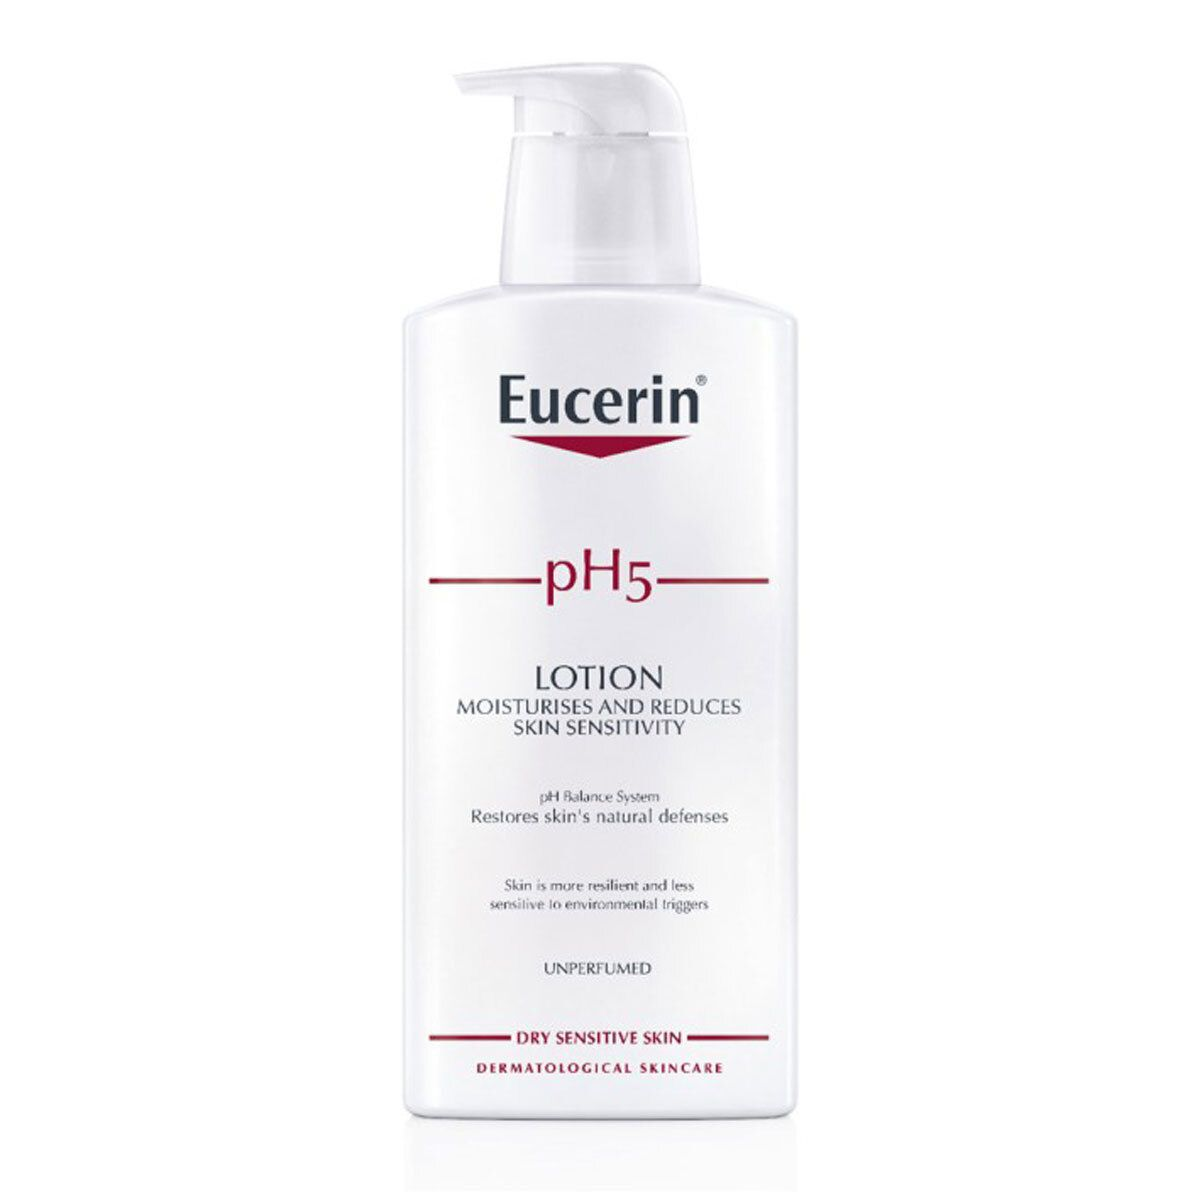 Bilderesultat for eucerin ph5 lotion uten parfyme